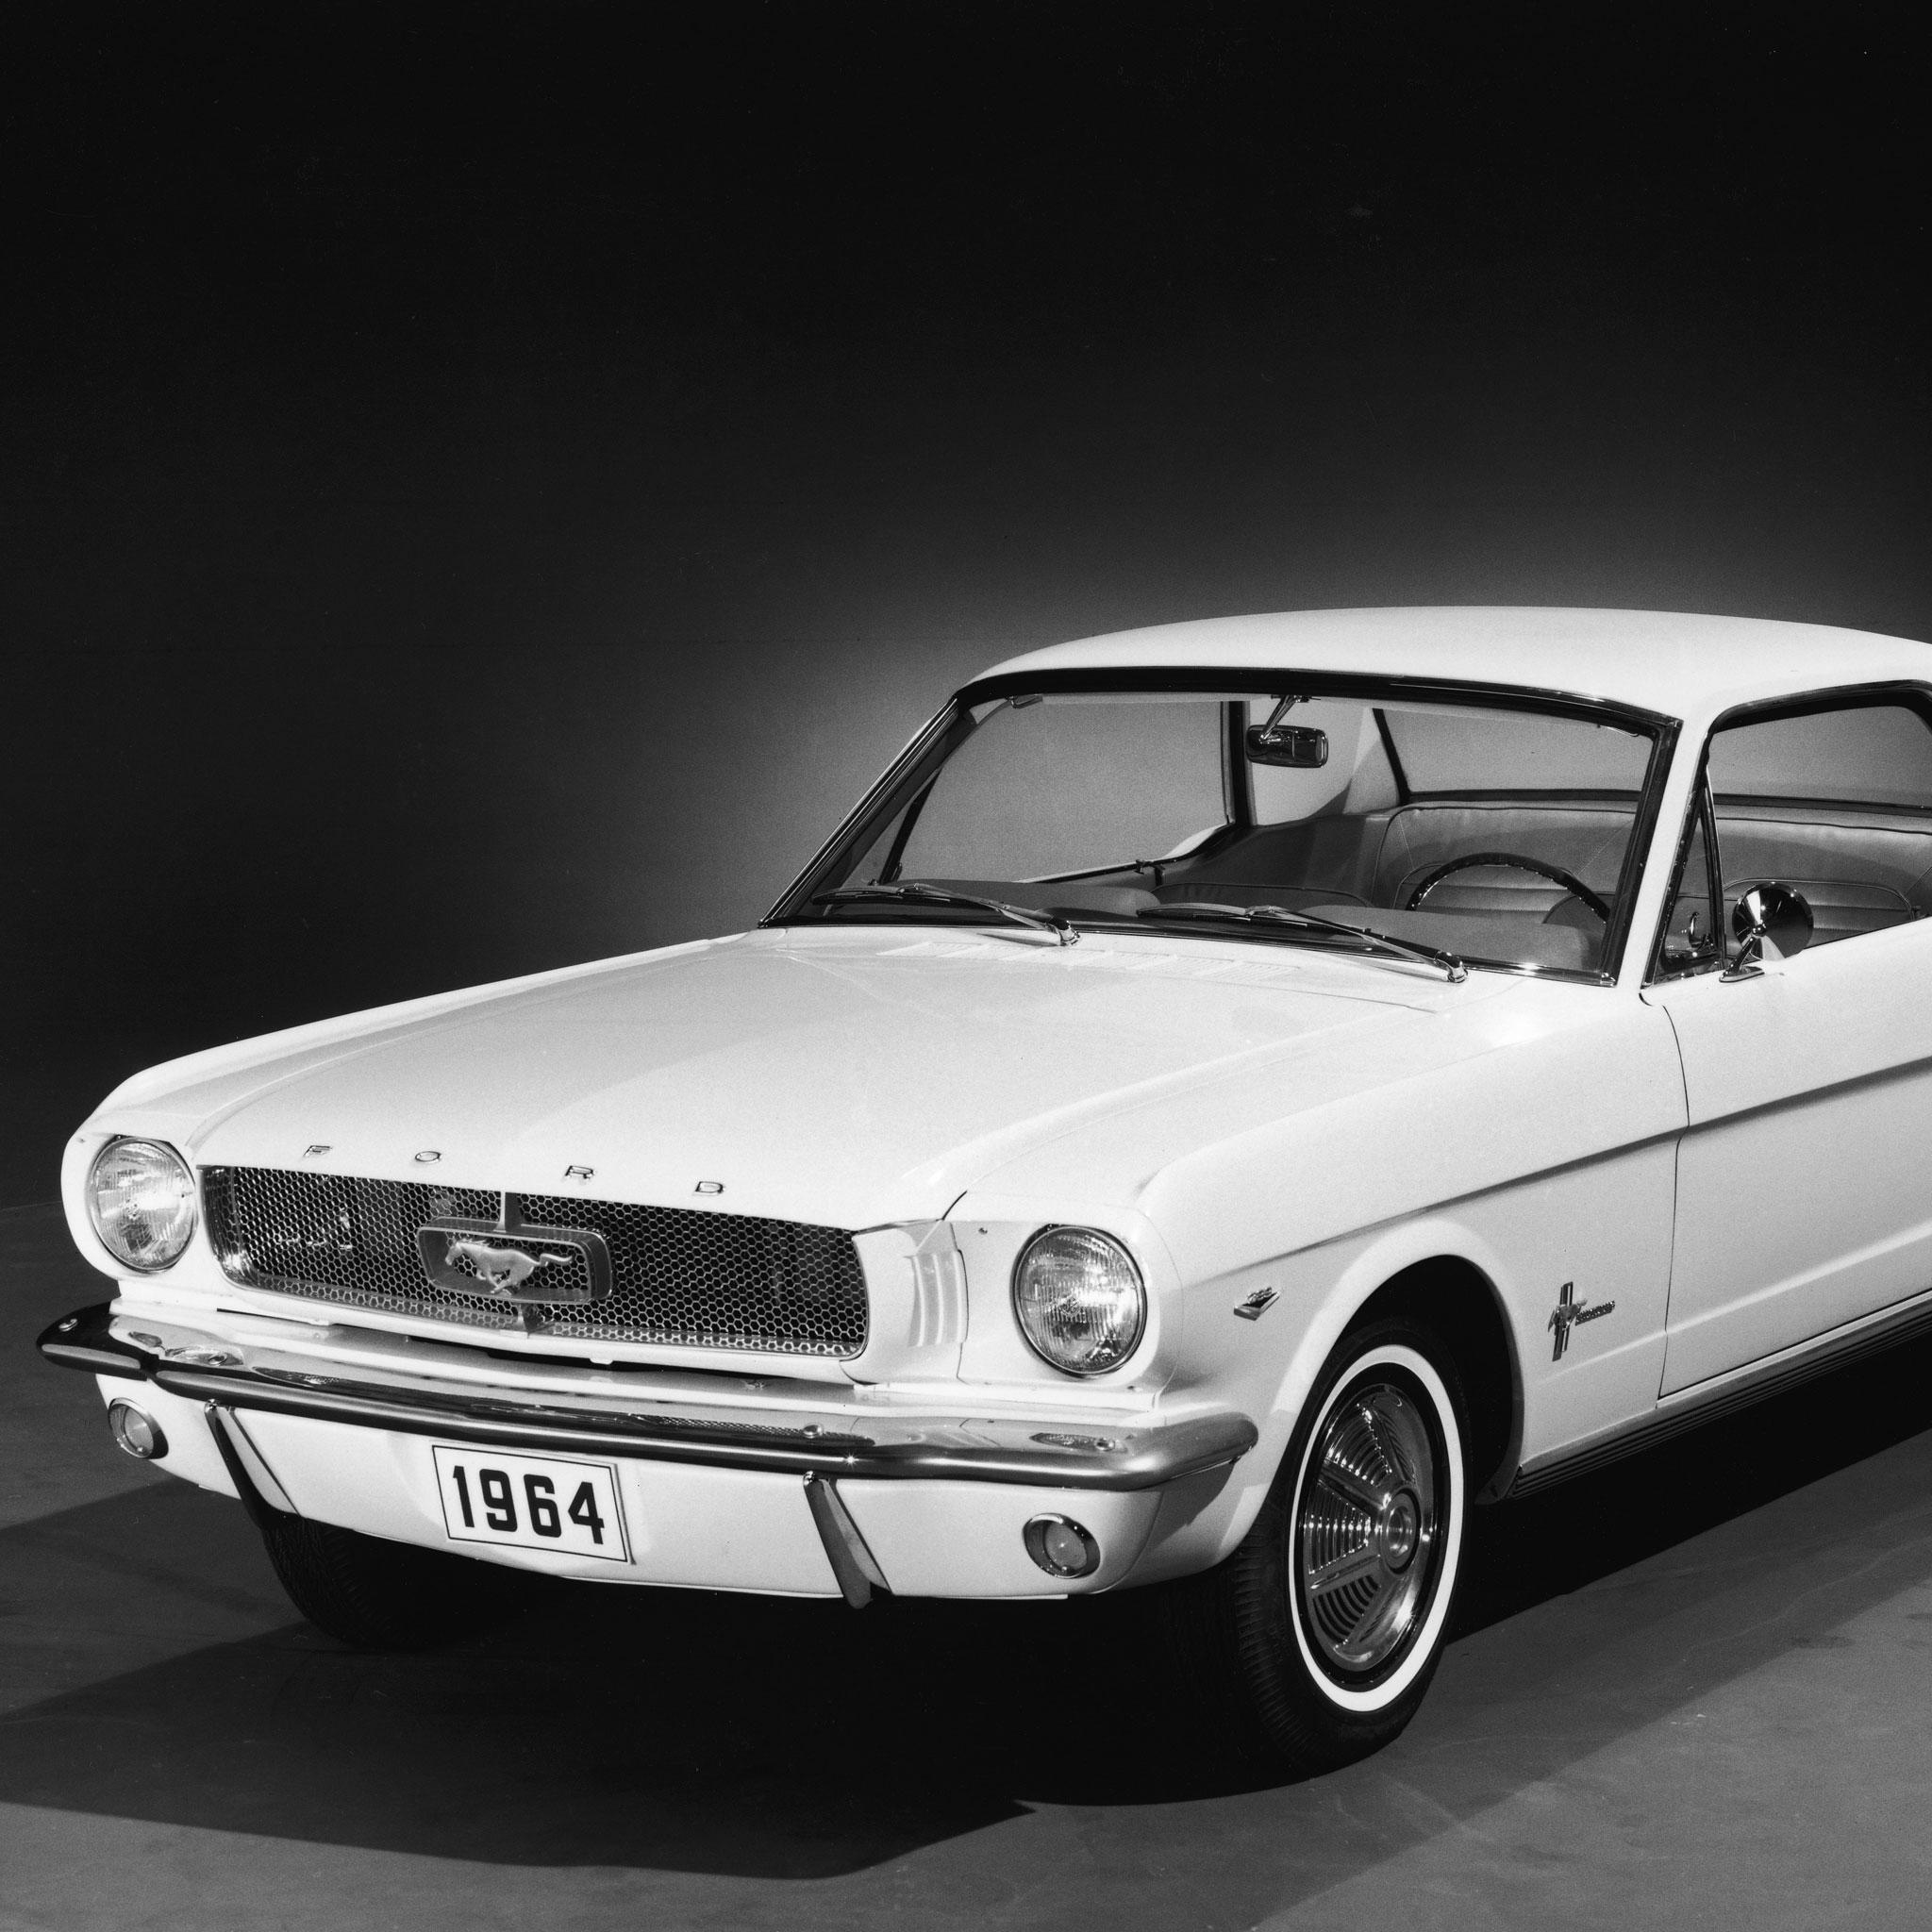 Mustang-1964-3Wallpapers-iPad-Retina